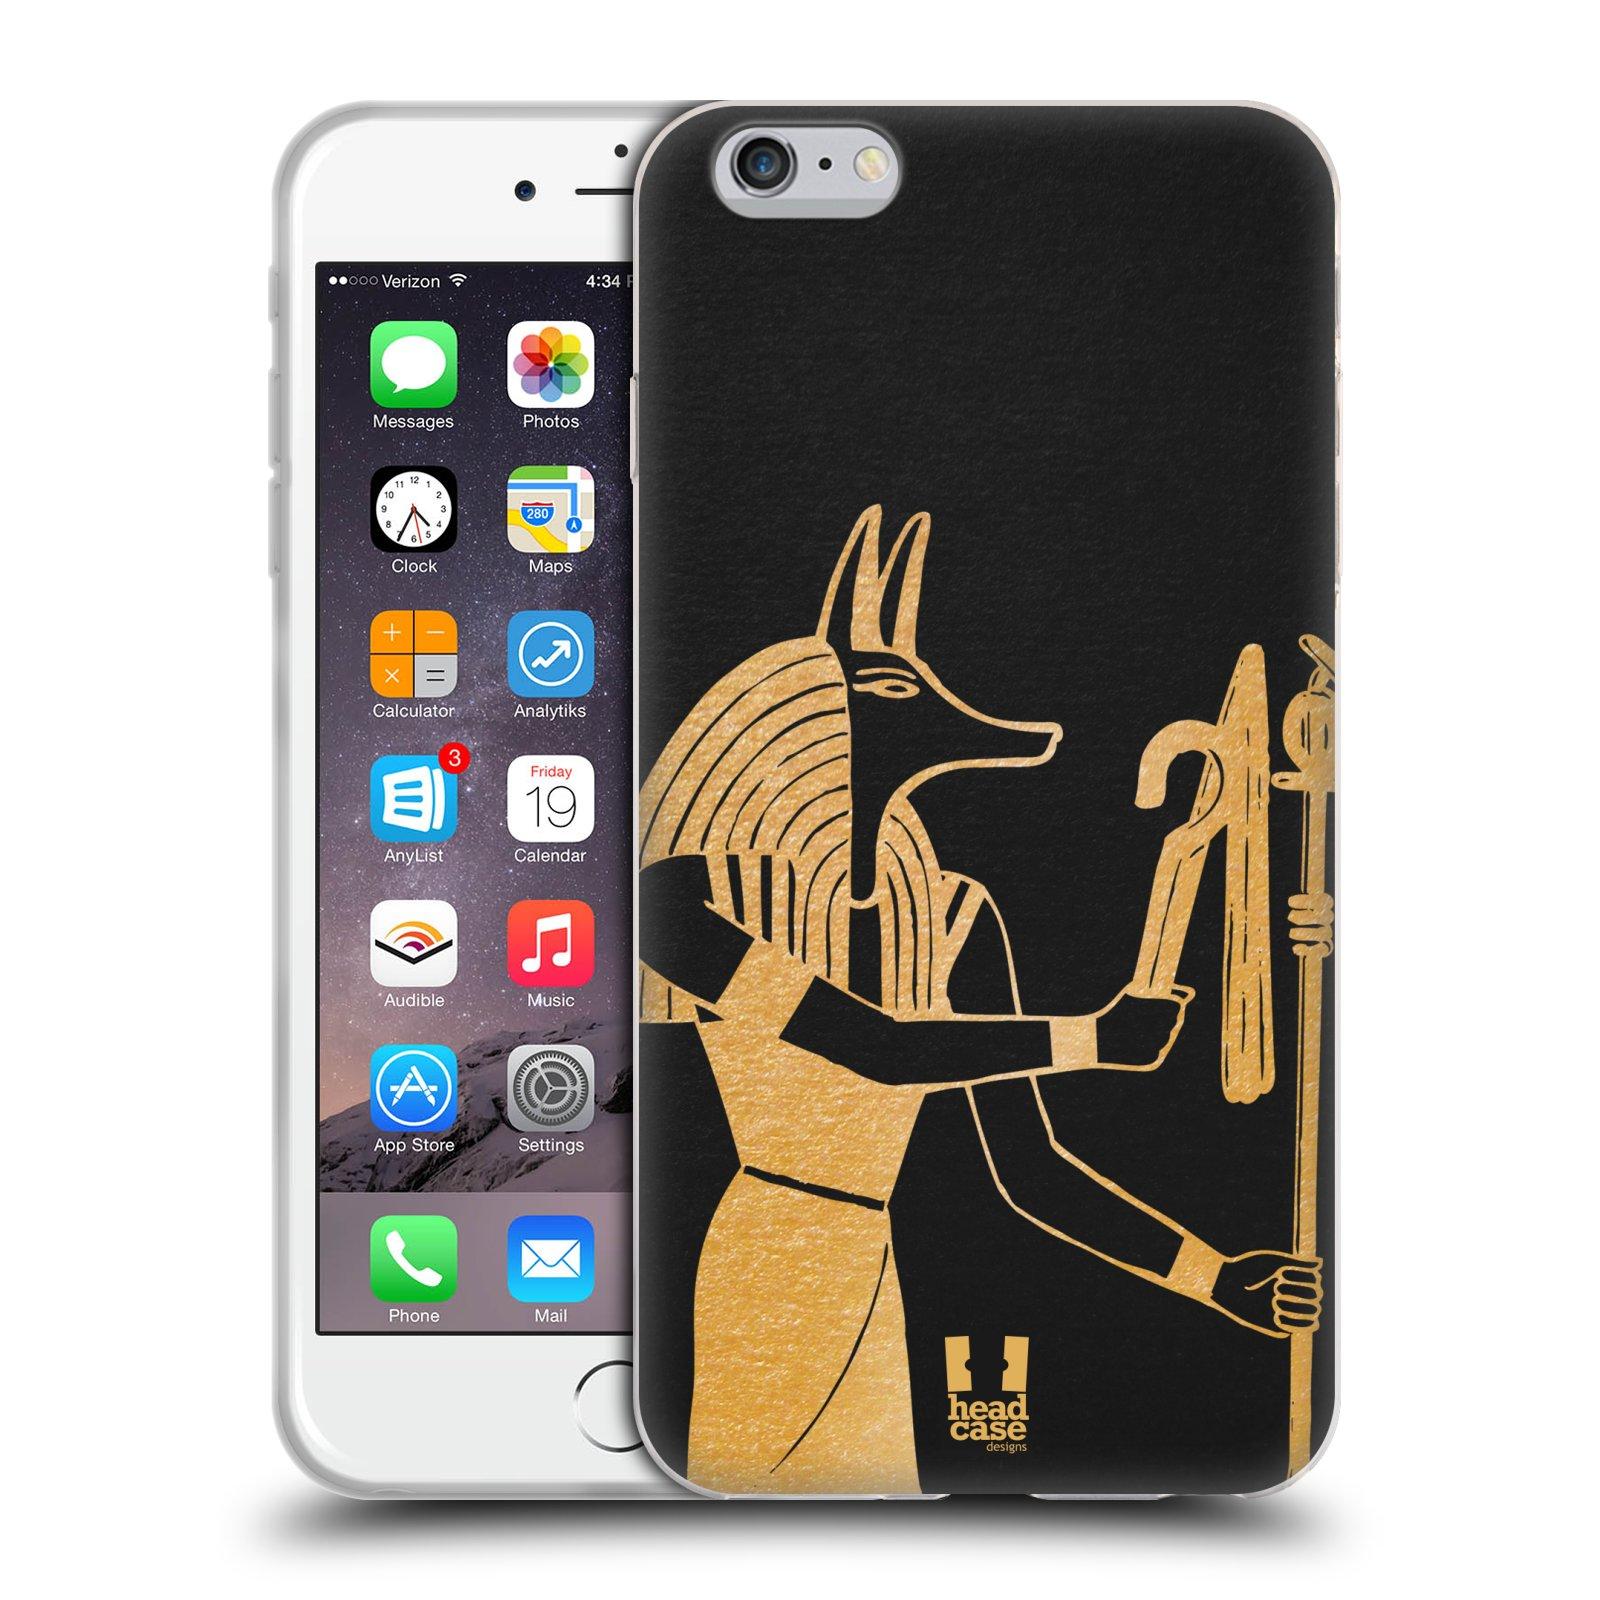 HEAD CASE silikonový obal na mobil Apple Iphone 6 PLUS/ 6S PLUS vzor EGYPT zlatá a černá Anubis